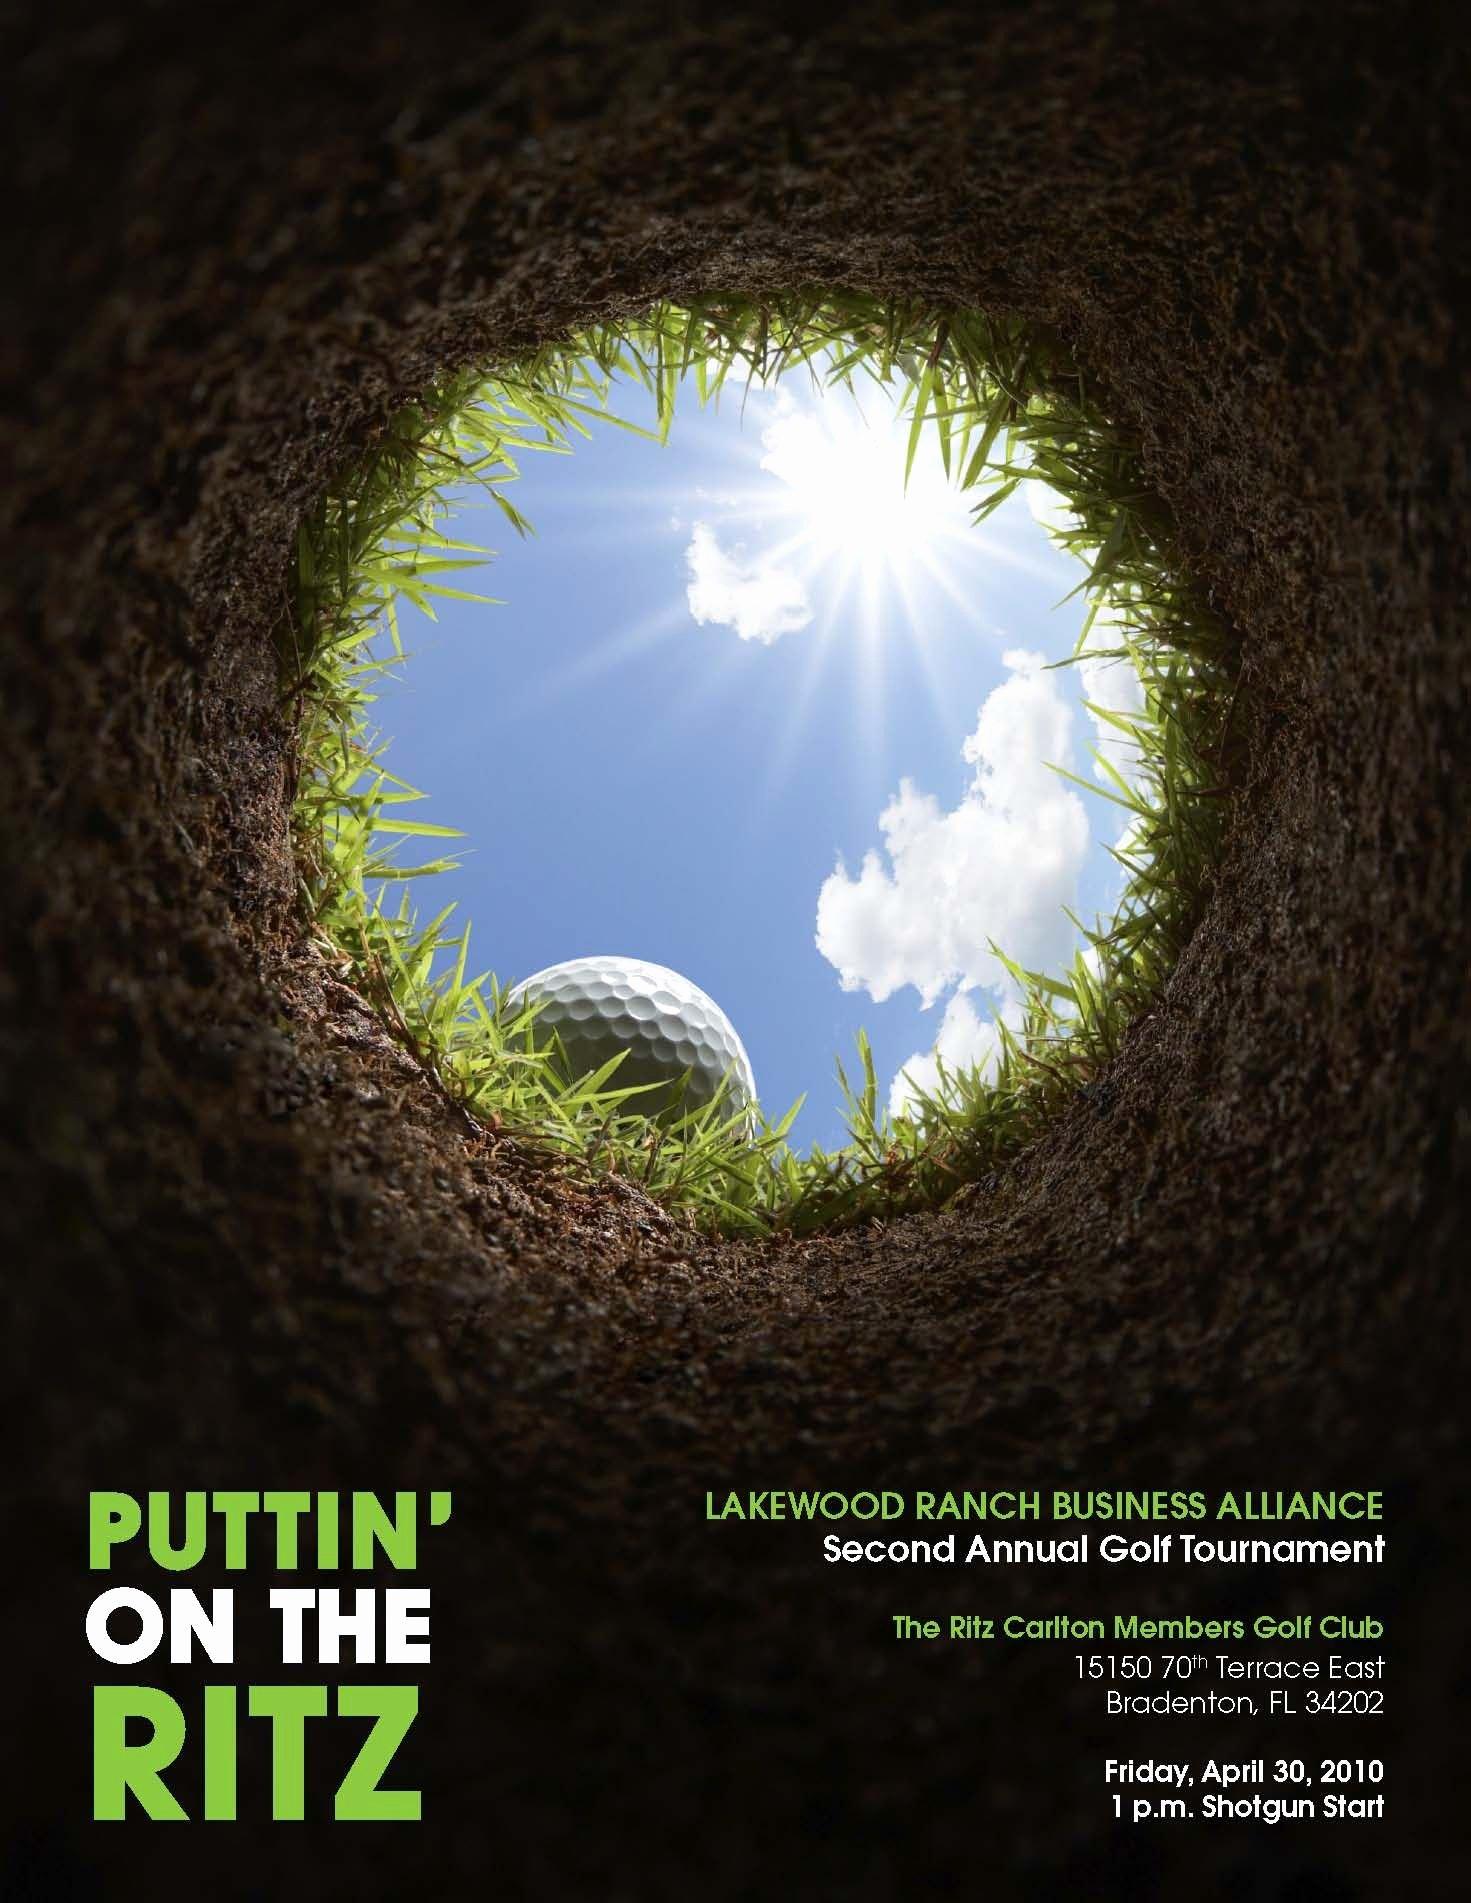 Charity Golf tournament Flyer Unique Golf tournament Flyer Design Inspiration Pinterest